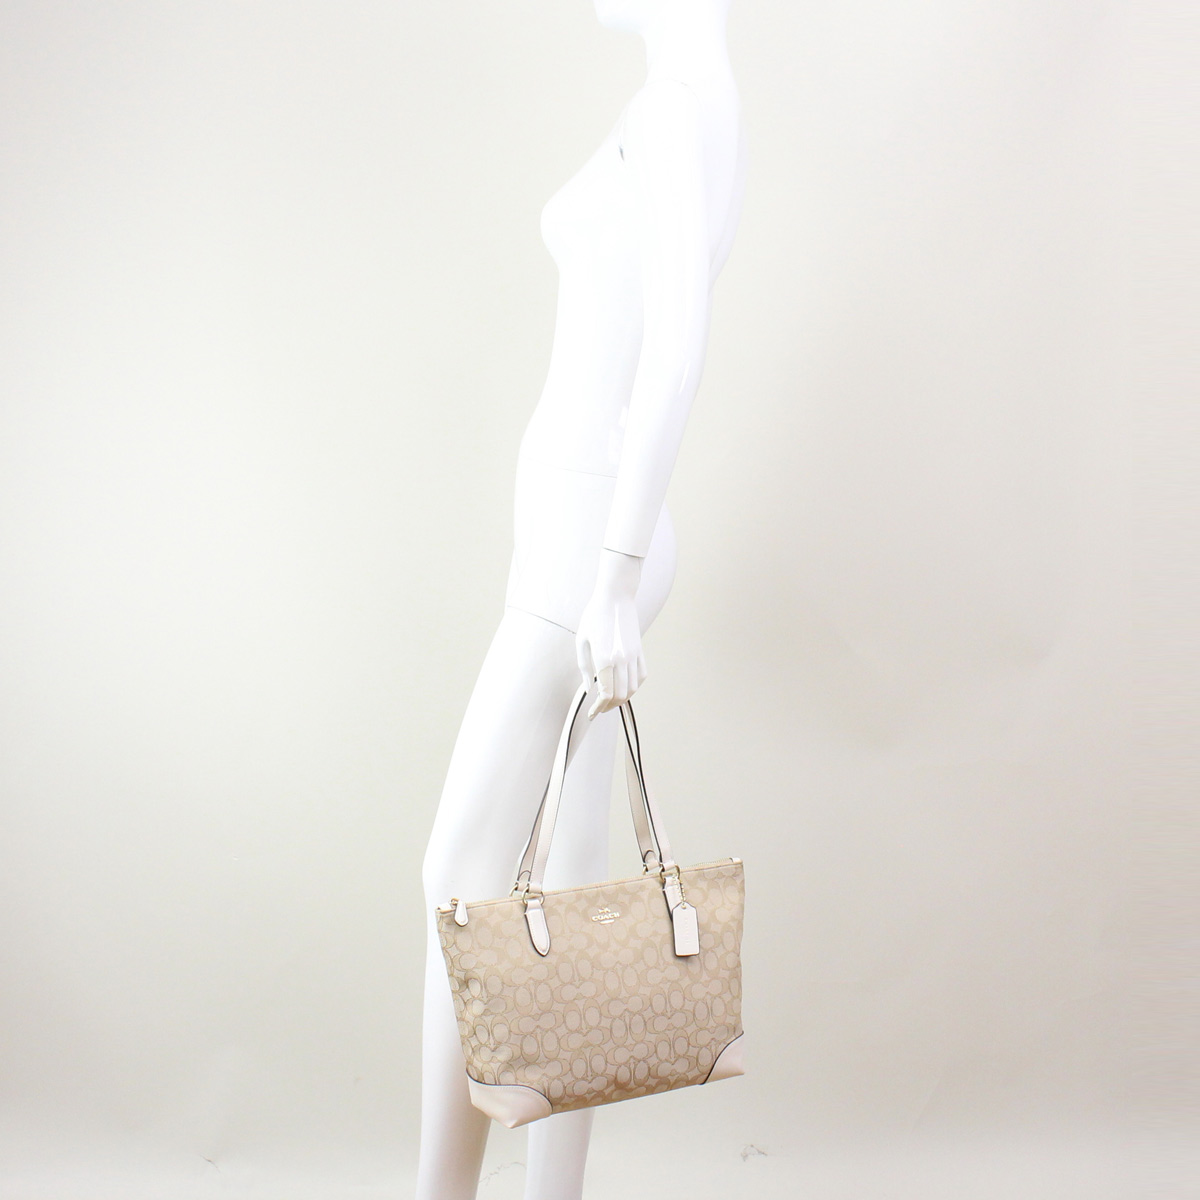 b7d8a96ce Bighit The total brand wholesale: Coach COACH signature tote bag ...